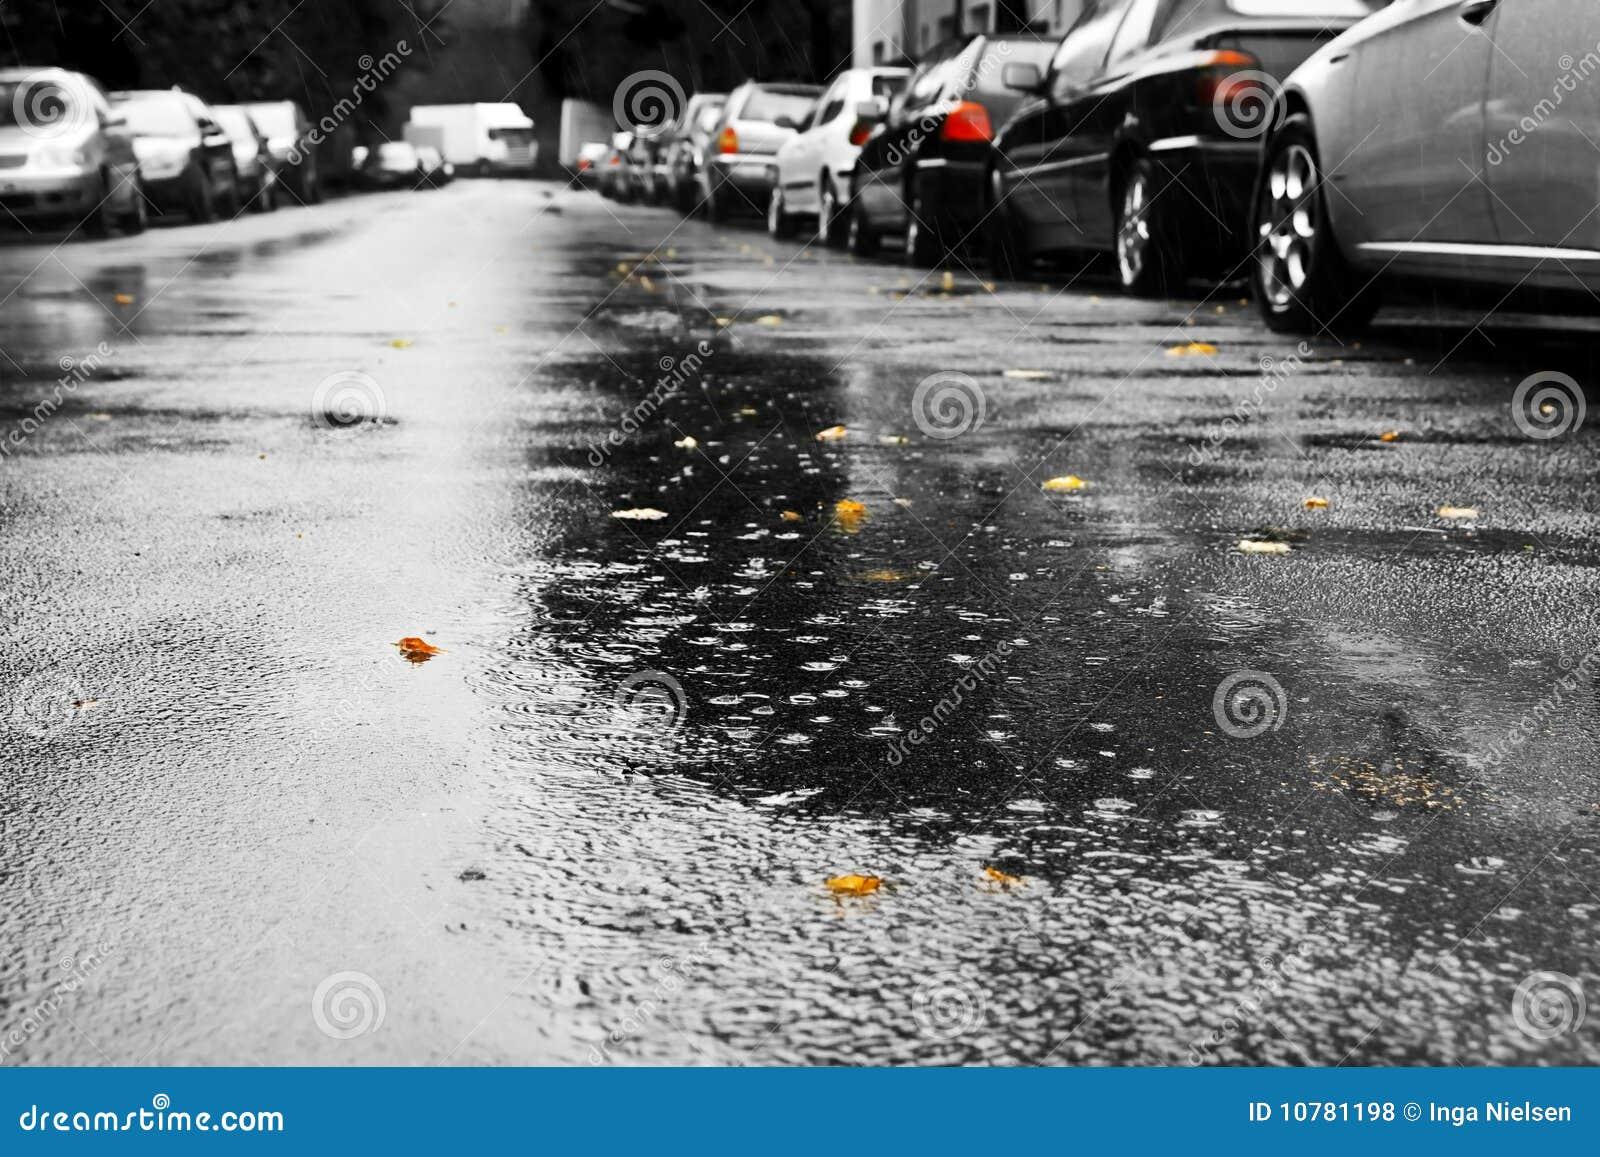 Rain and cars